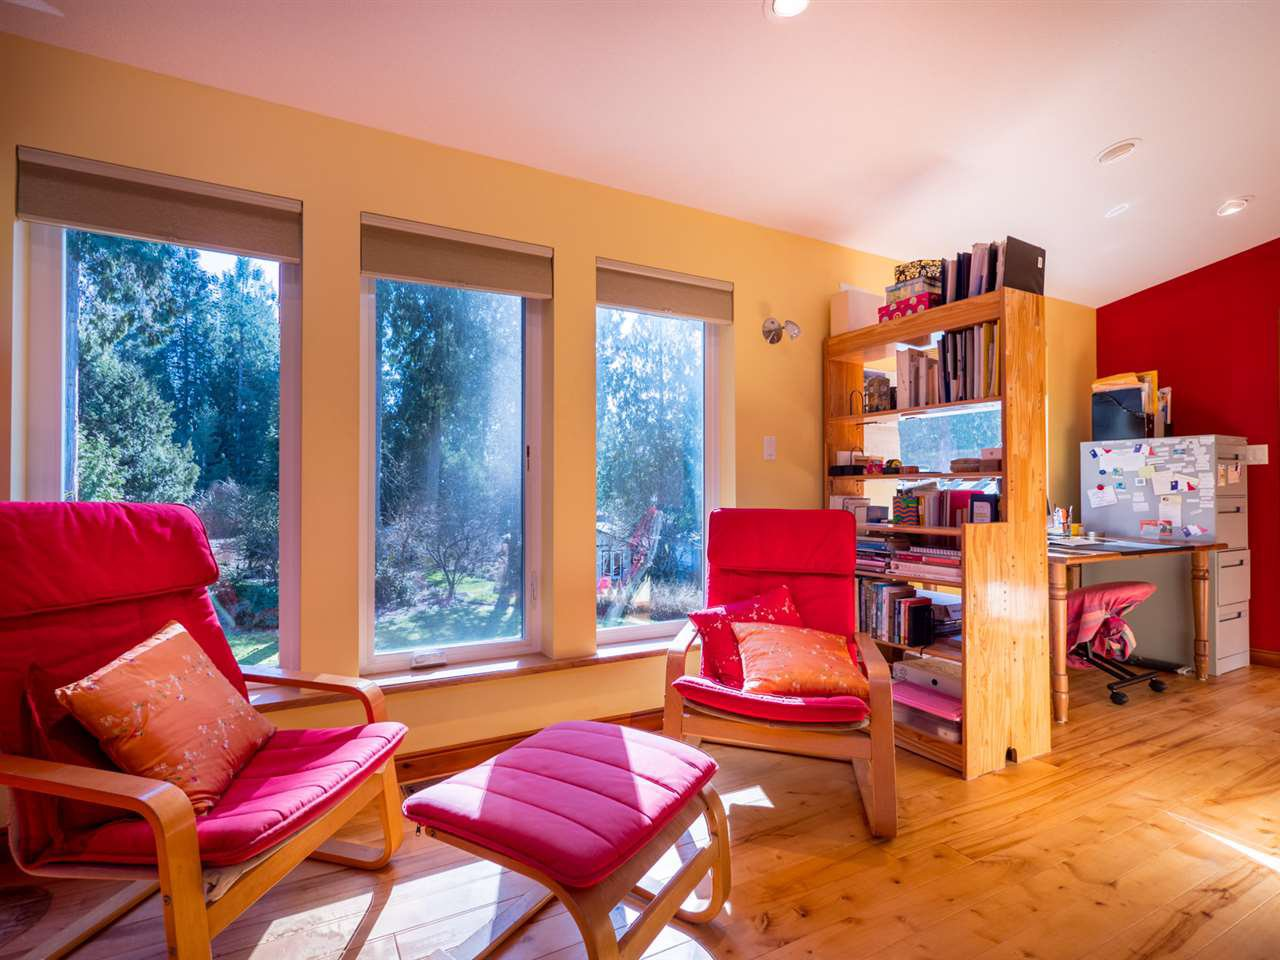 Photo 4: Photos: 3592 BEACH Avenue: Roberts Creek House for sale (Sunshine Coast)  : MLS®# R2244747